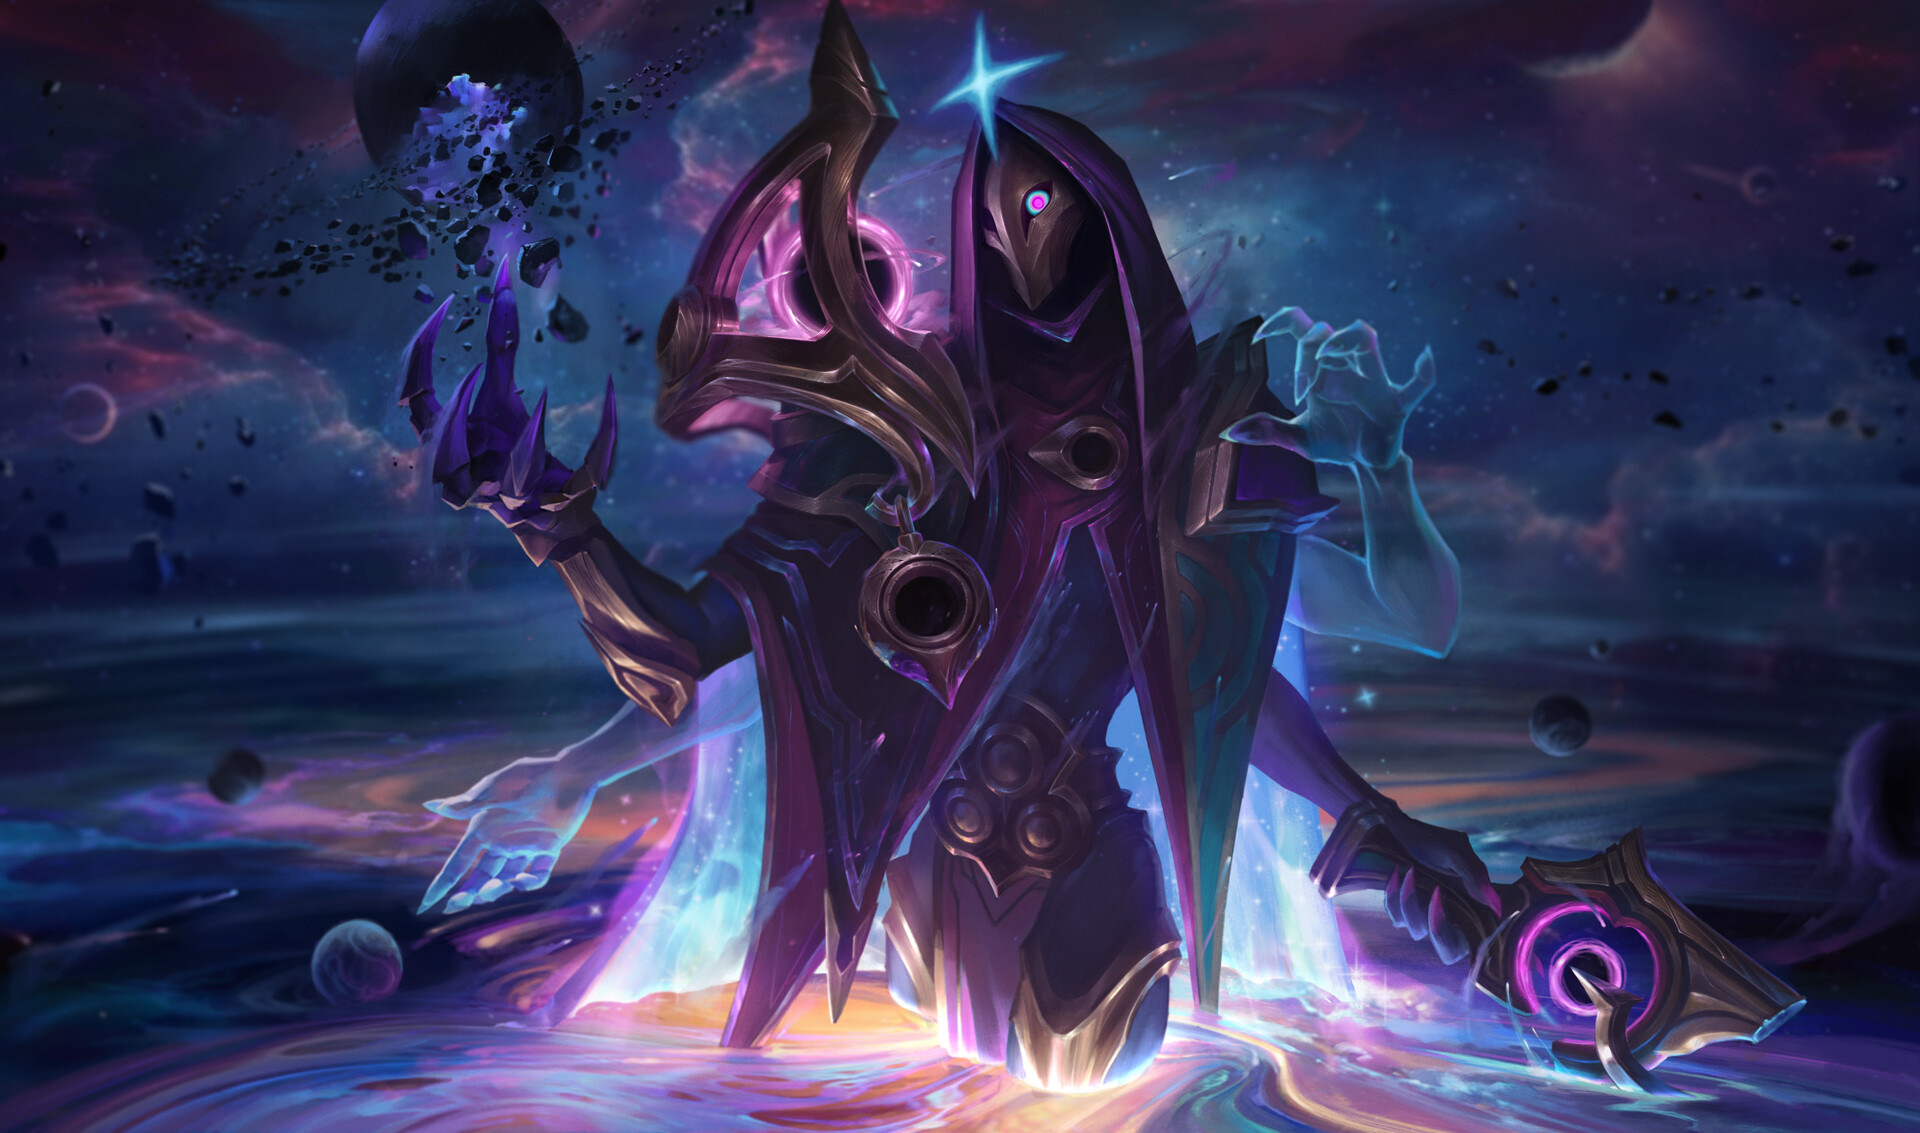 Art from League of Legends